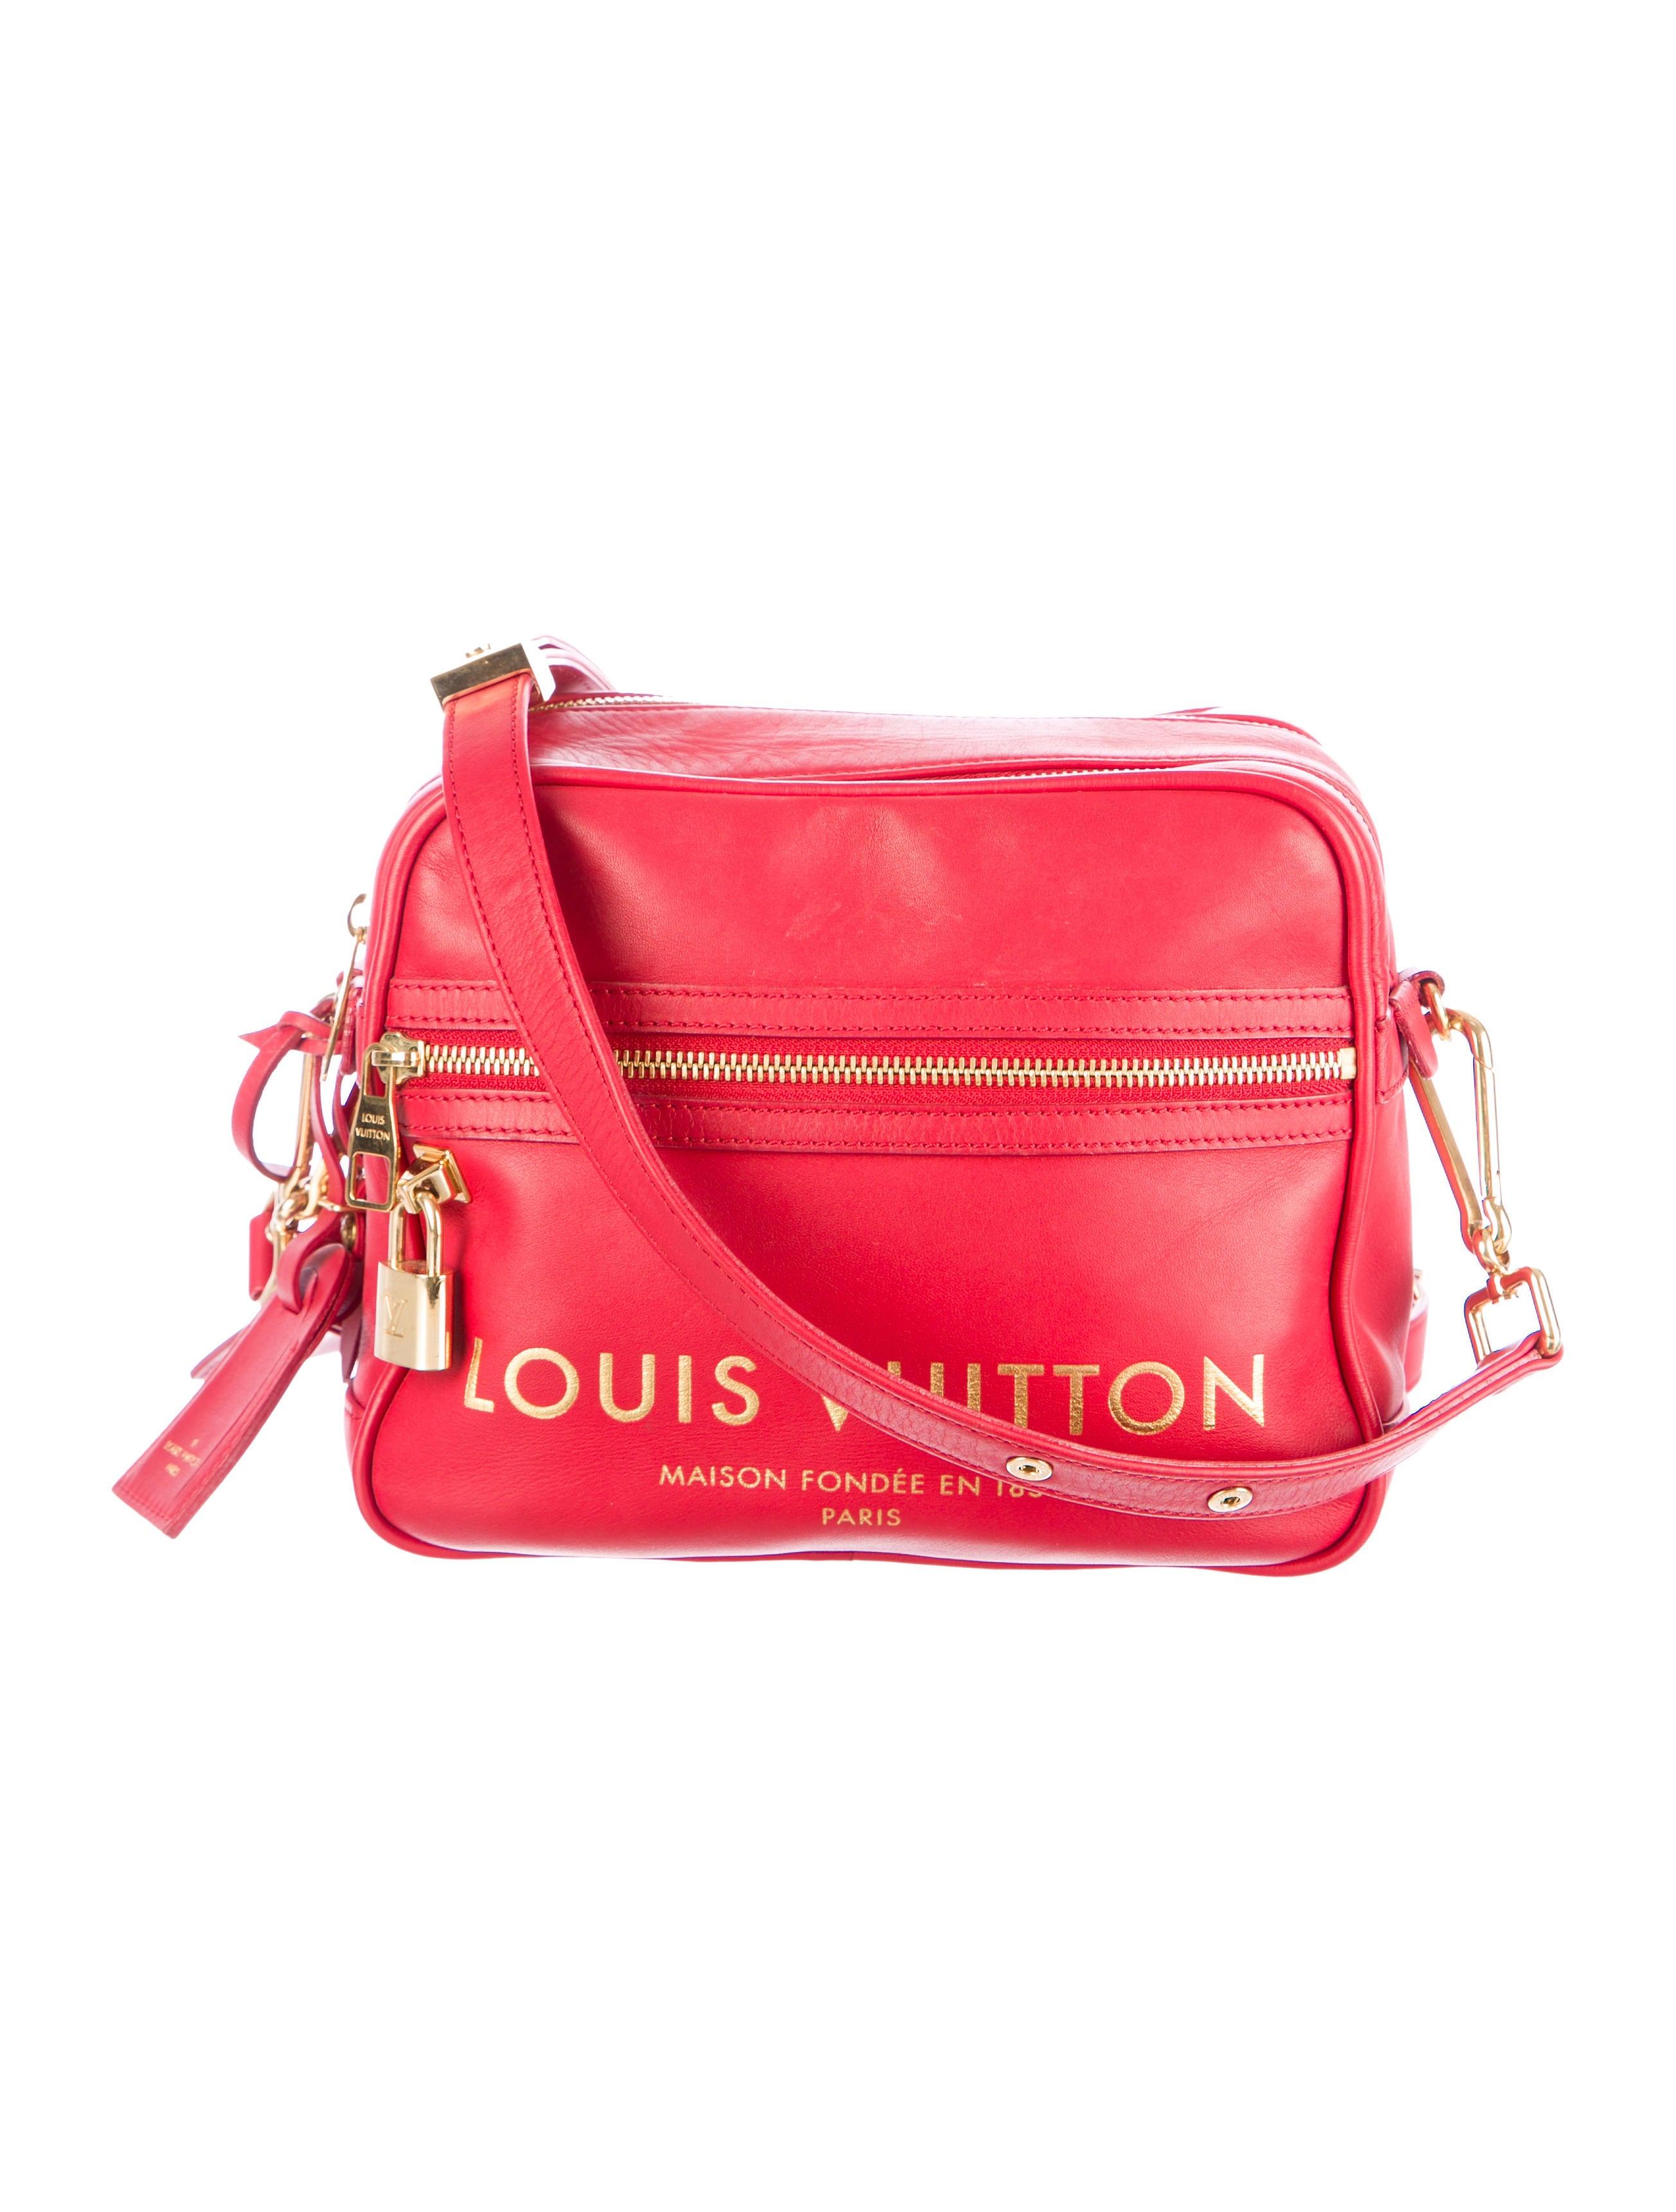 8c0f653259f4 Louis Vuitton Flight Bag Paname Takeoff - Handbags - LOU64196